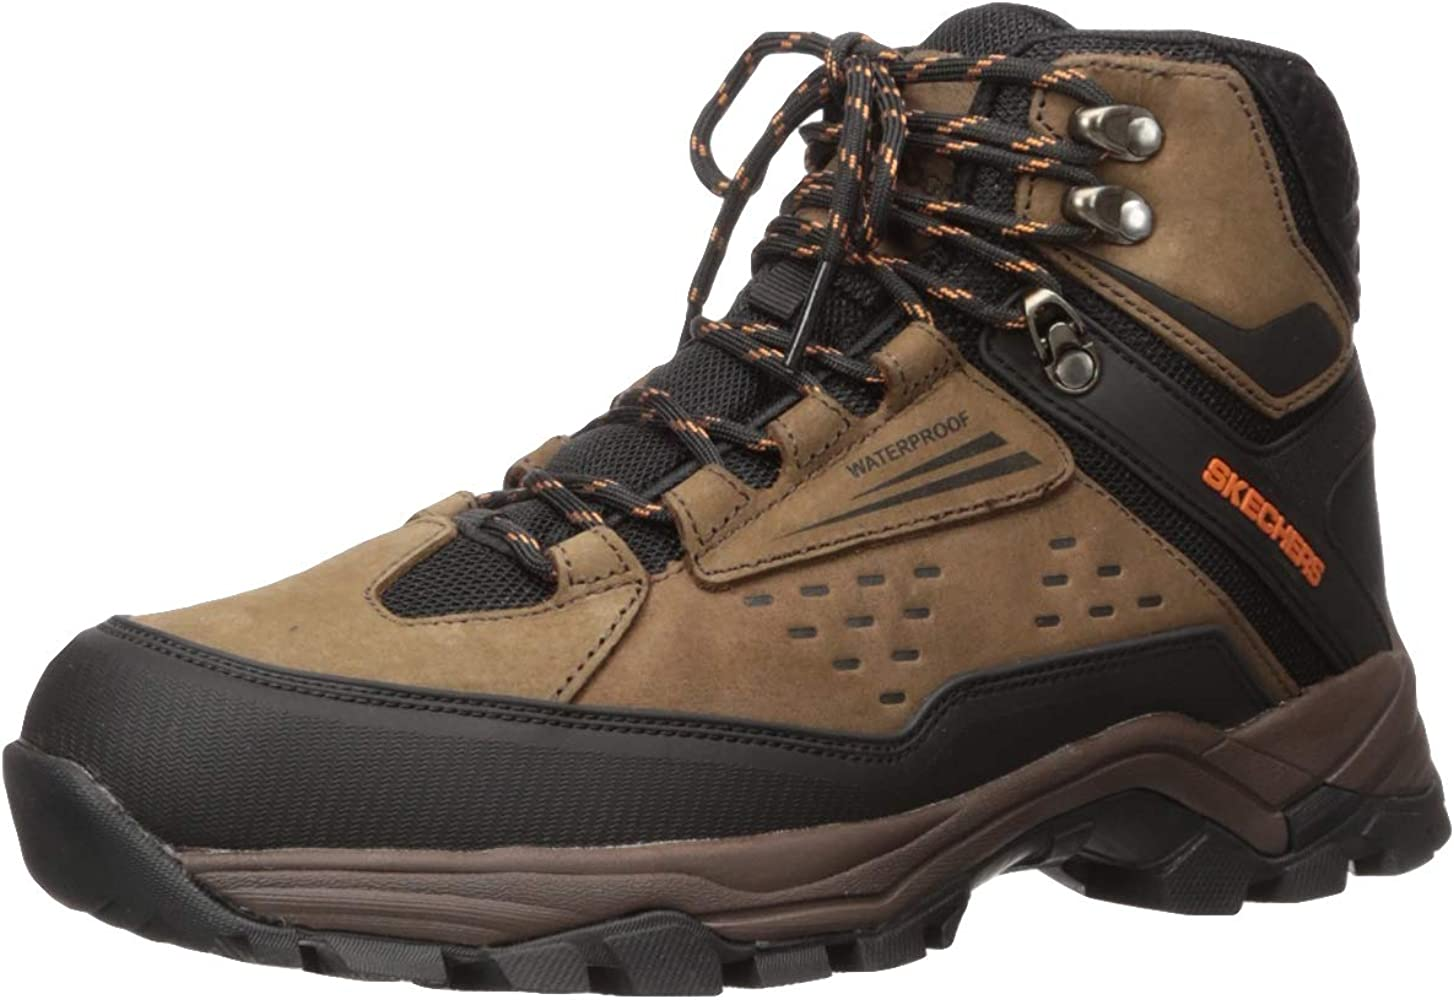 Skechers Men's Polano Norwood Waterproof Hiker Hiking Boot